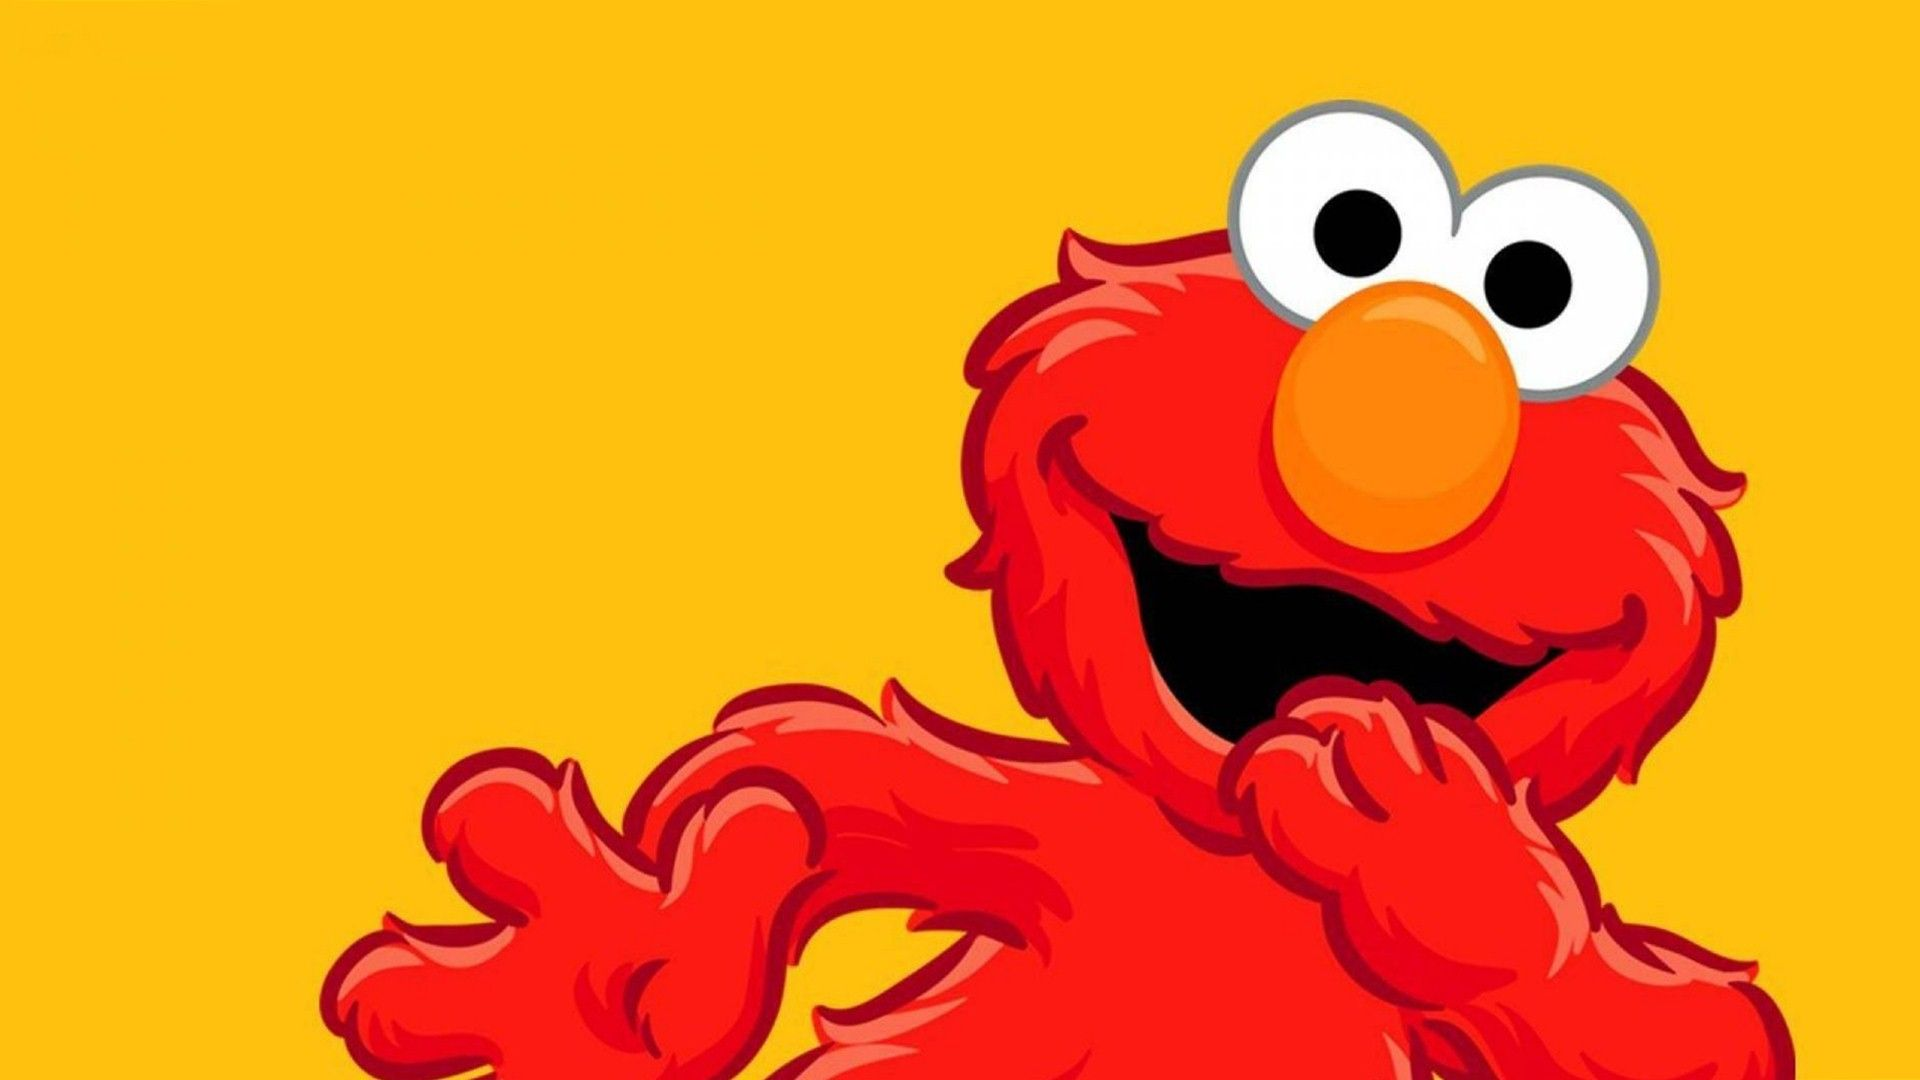 Elmo Wallpaper Humor Engracado Engracado Vila Sesamo